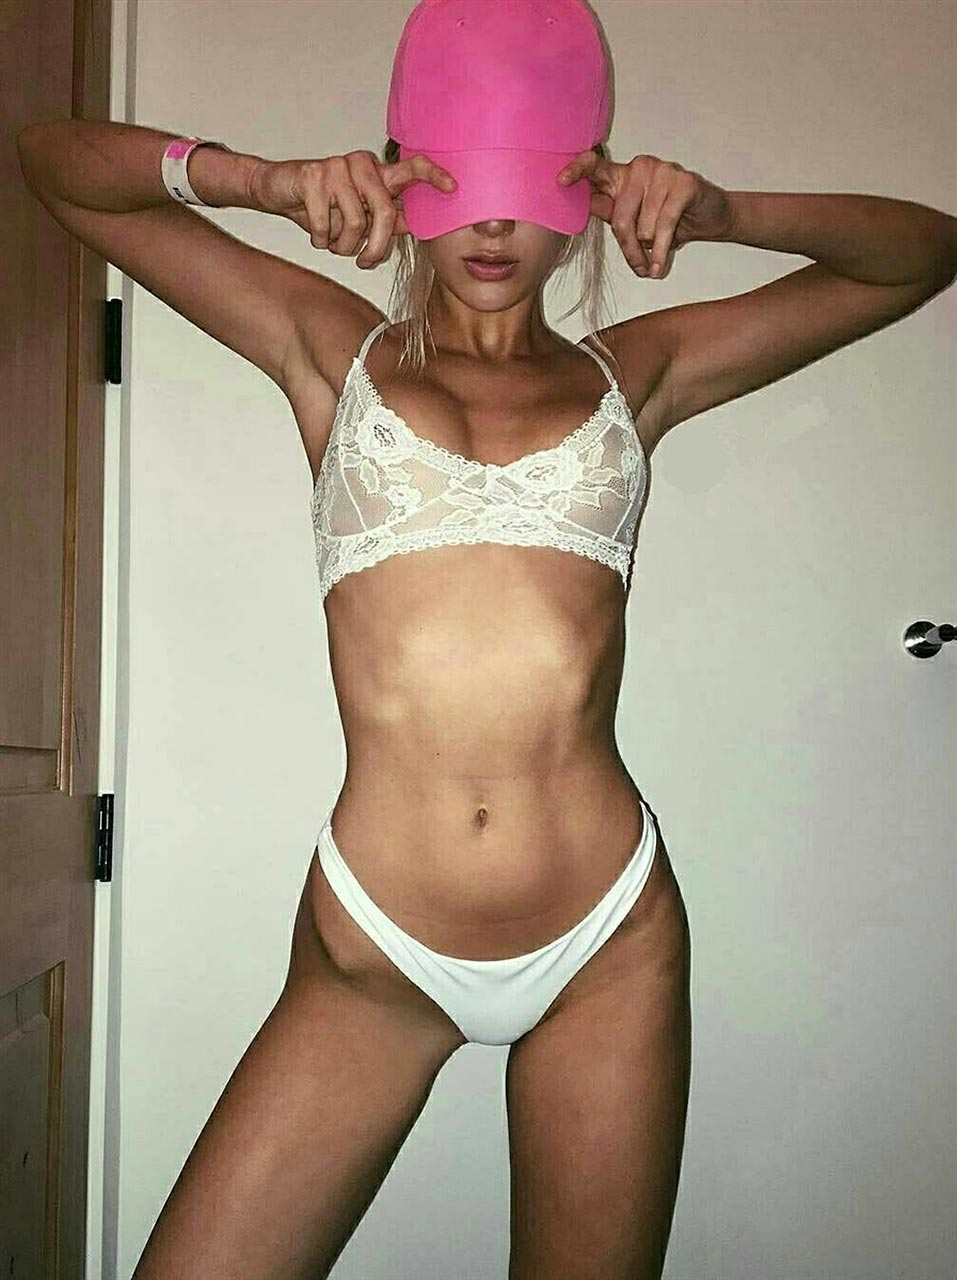 Hot ! Youtuber Alissa Violet Nude Leaked Private Selfies